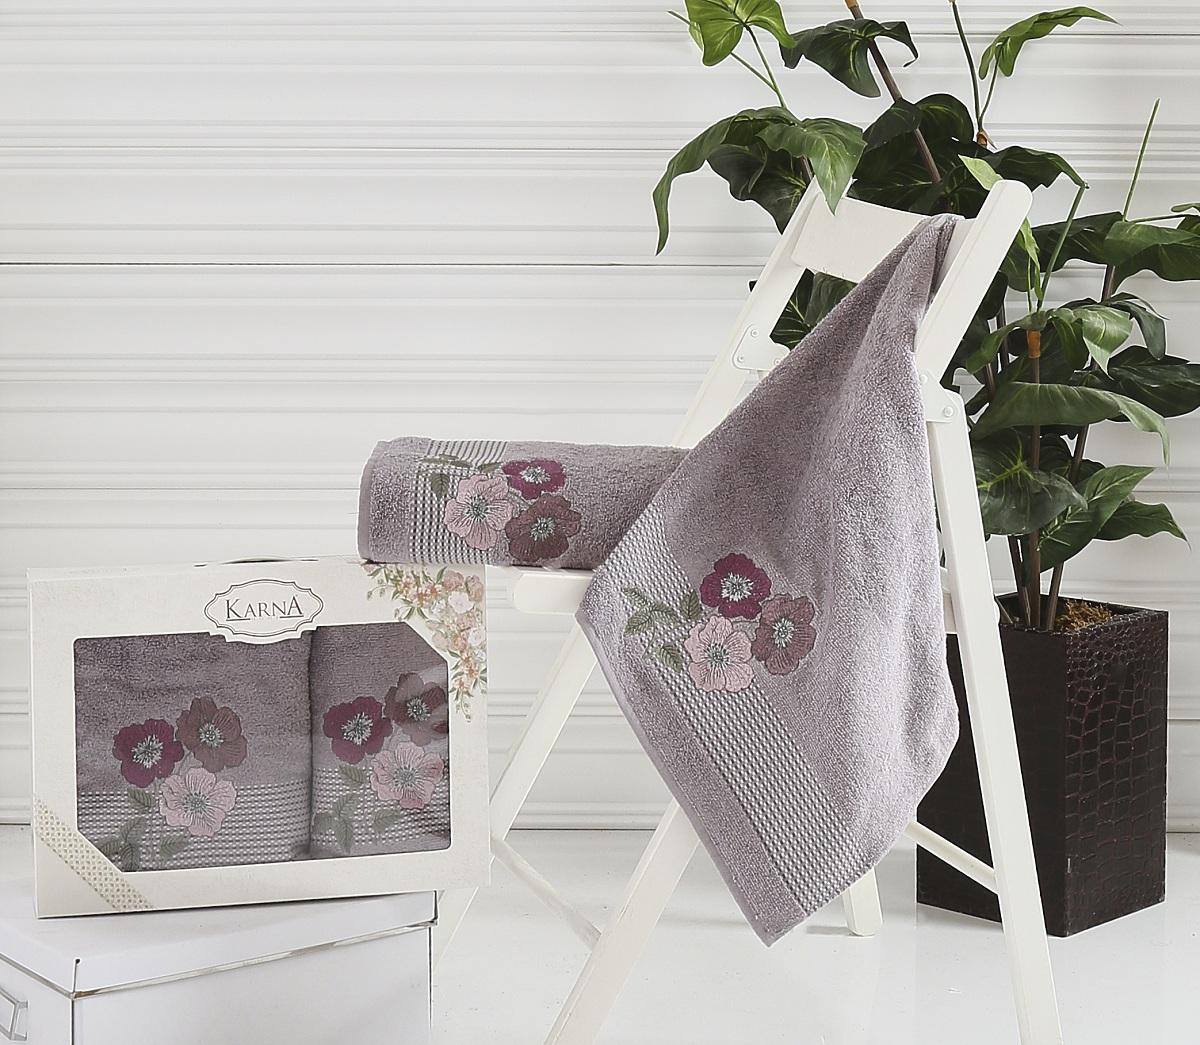 Набор полотенец Karna Sandy, цвет: темно-серый, 2 шт2390/CHAR006